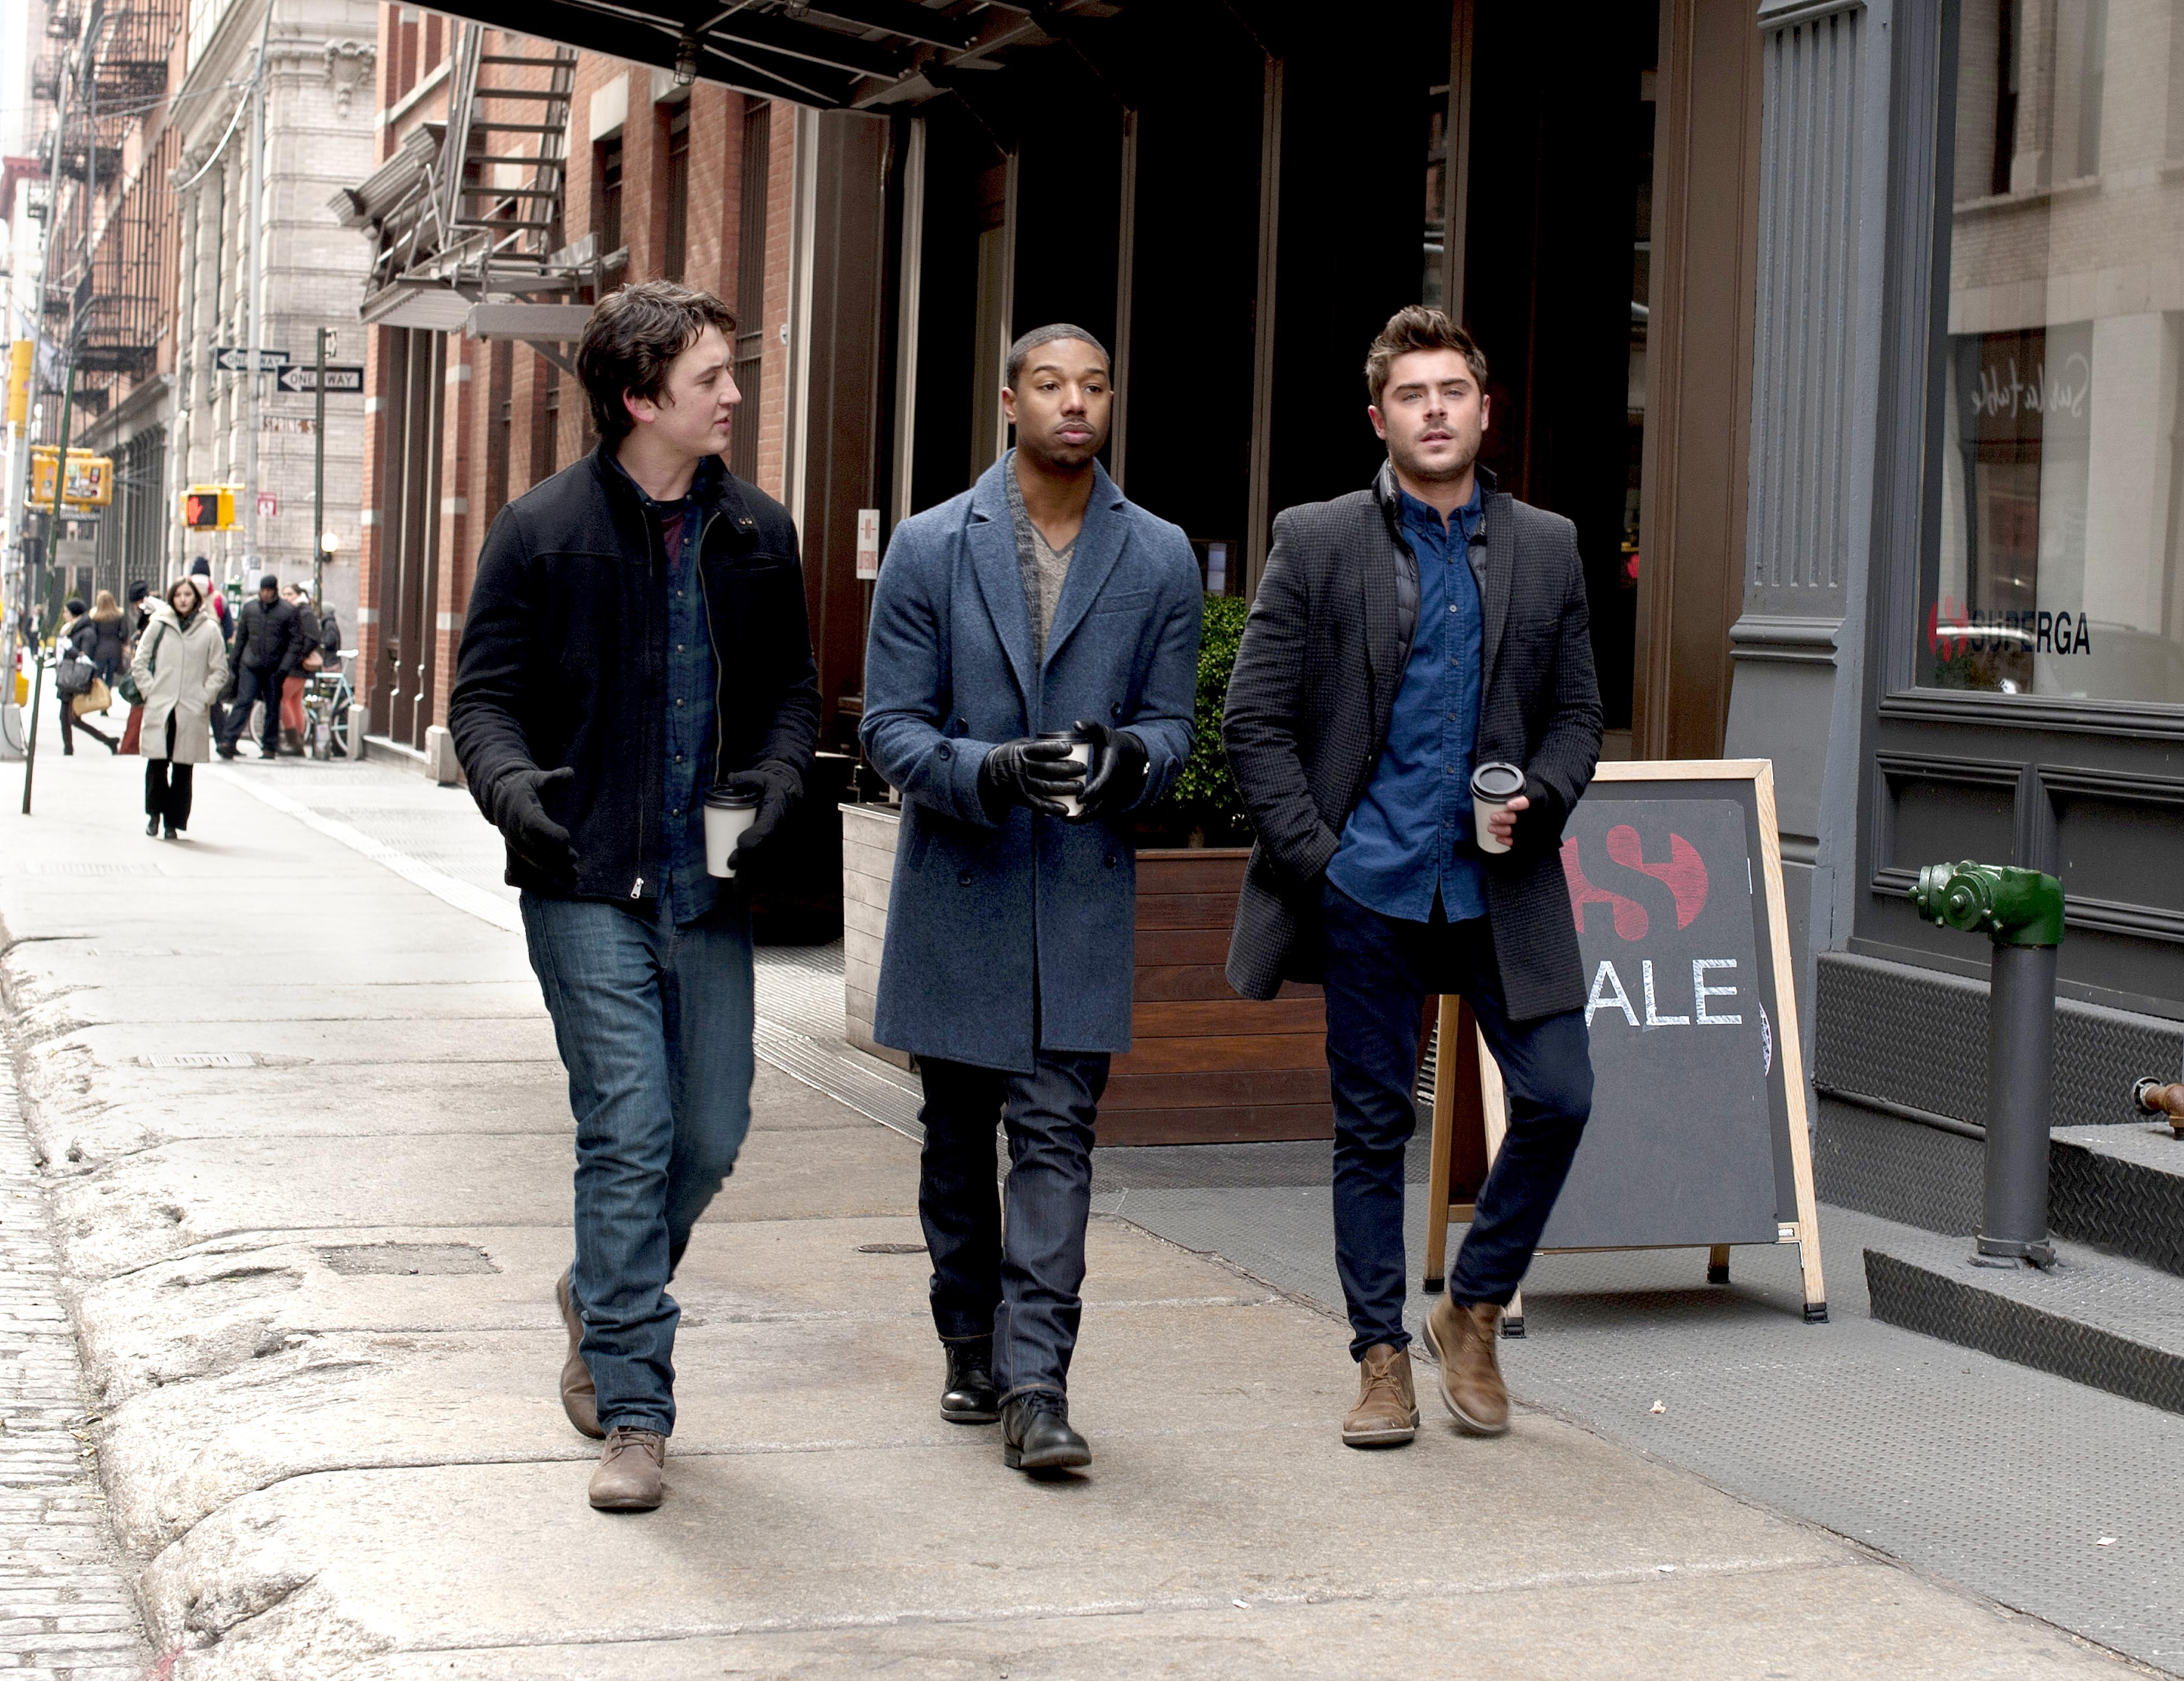 Miles Teller, Michael B. Jordan, Zac Efron, That Awkward Moment